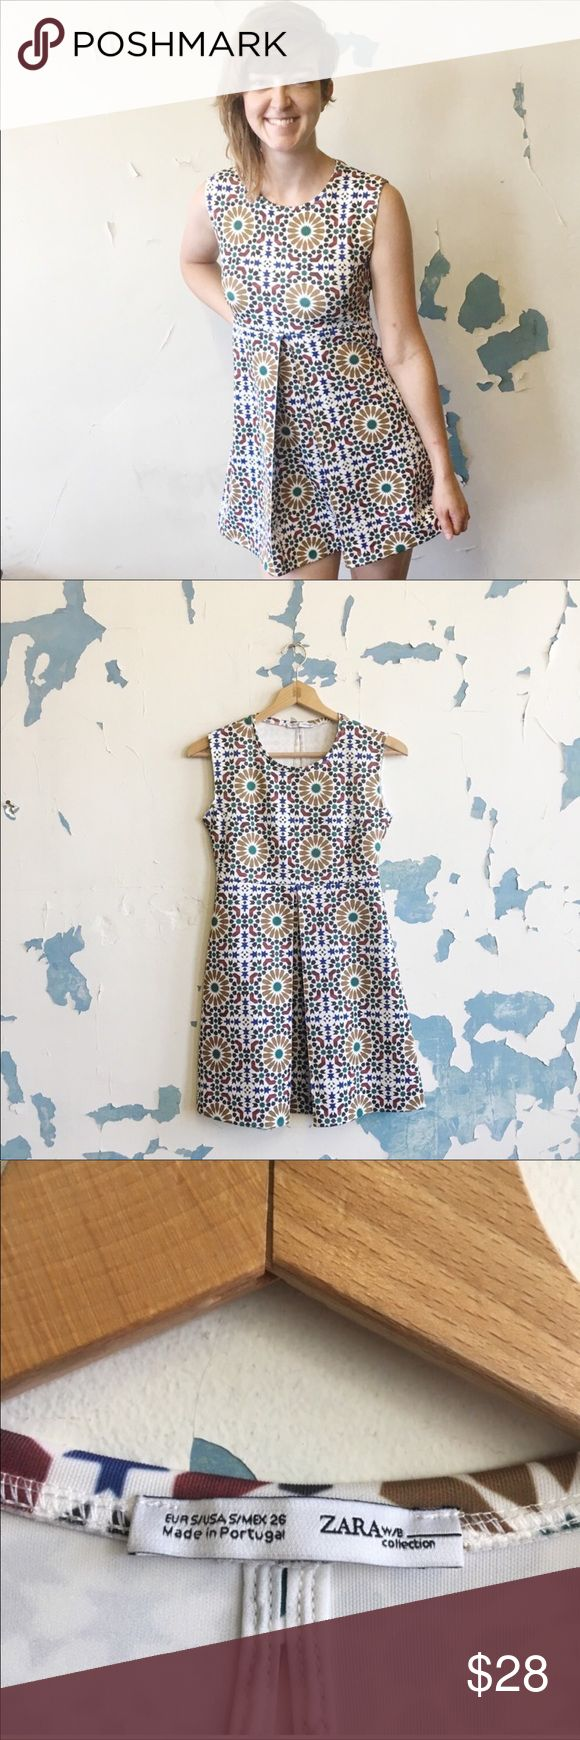 Zara | Geometric Aztec Print Neoprene Skater Dress This modern geometric print d... 1